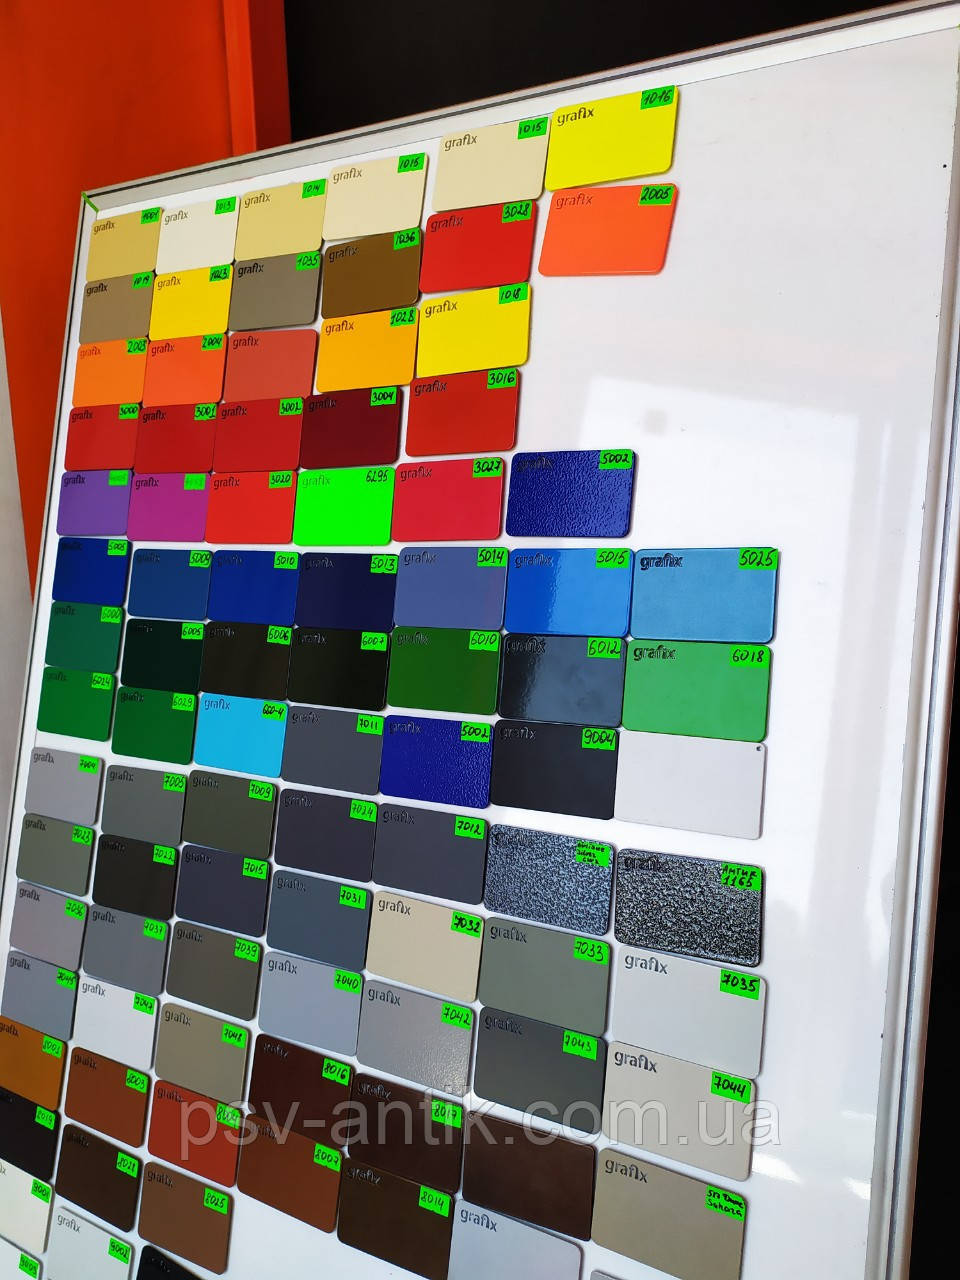 Порошковая краска глянцевая, полиэфирная, архитектурная, 4011